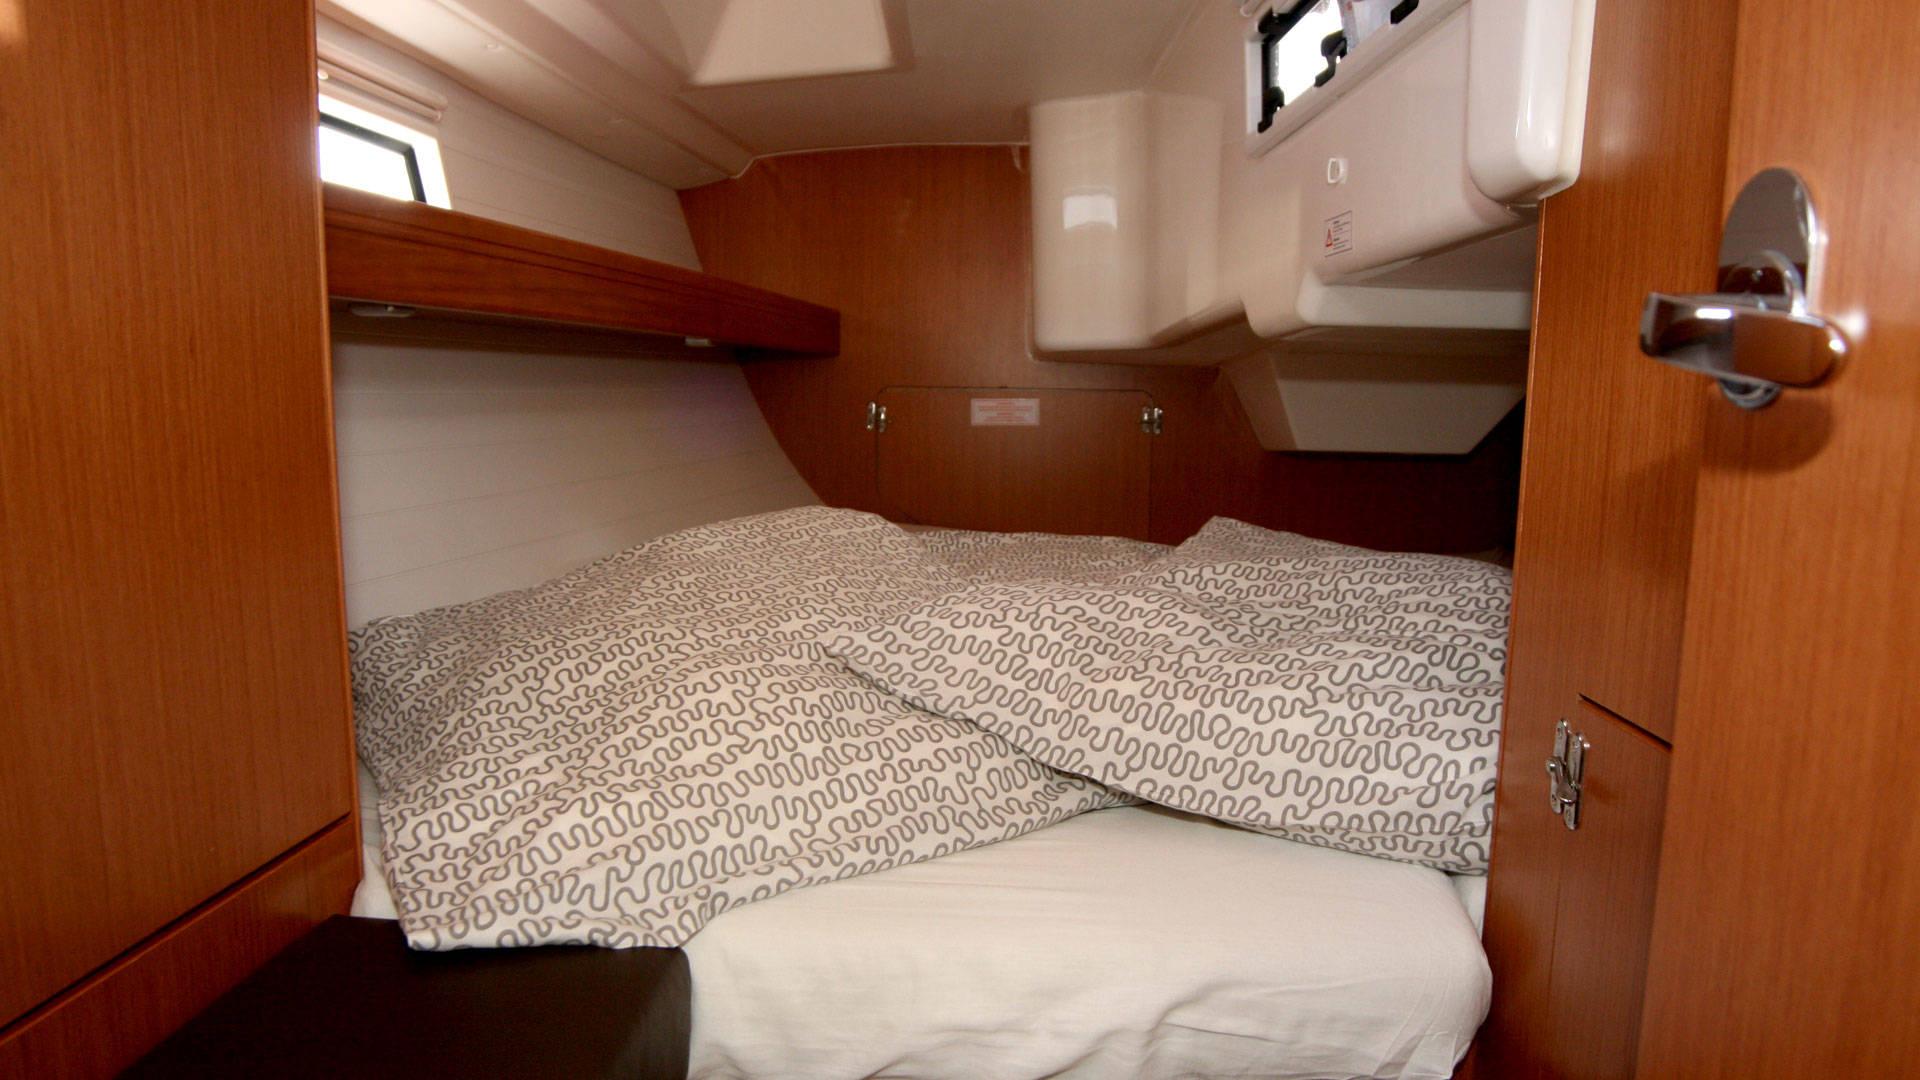 Bavaria Cruiser 33, Chili